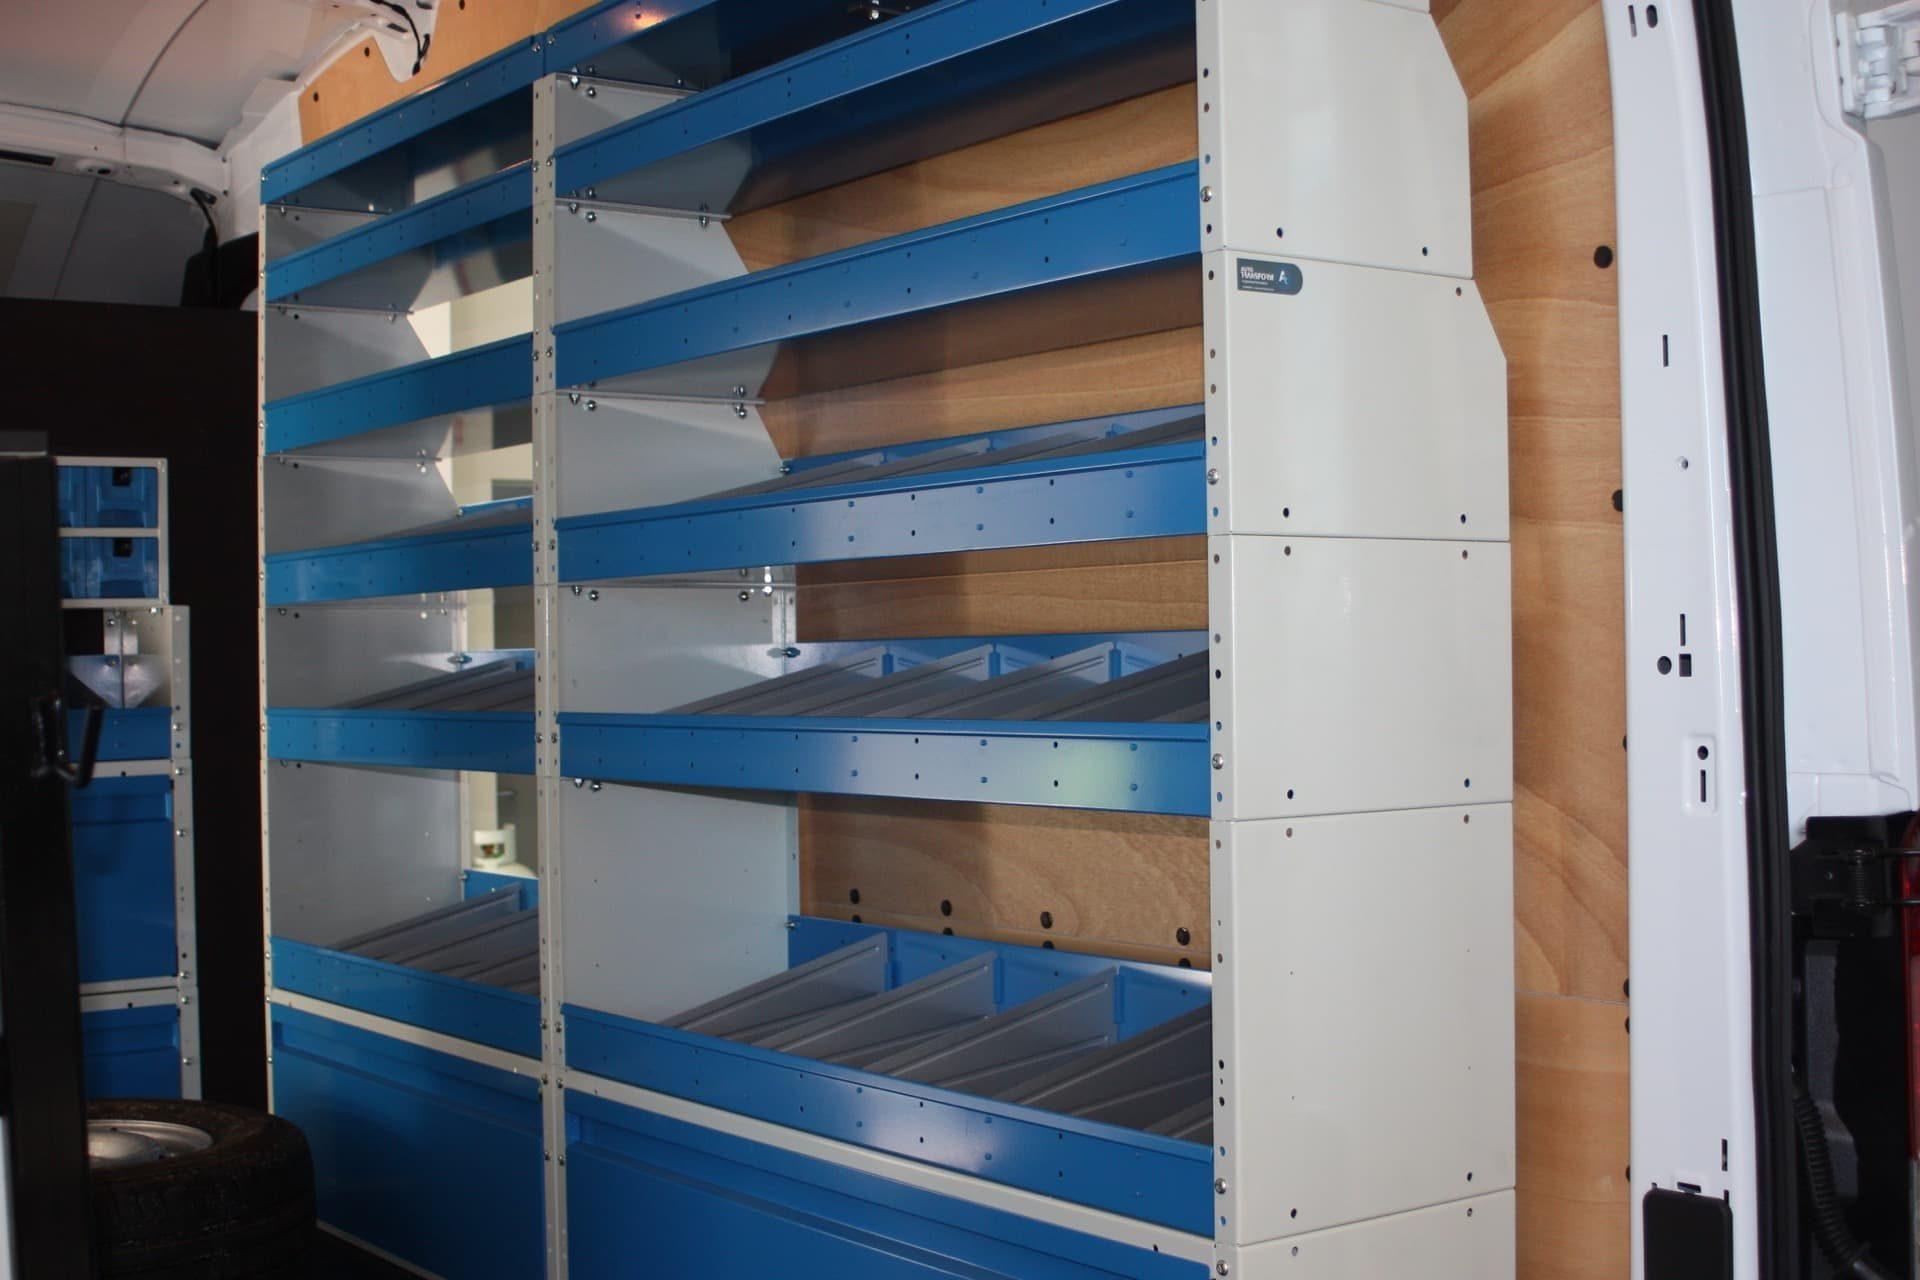 Commercial van shelving storage